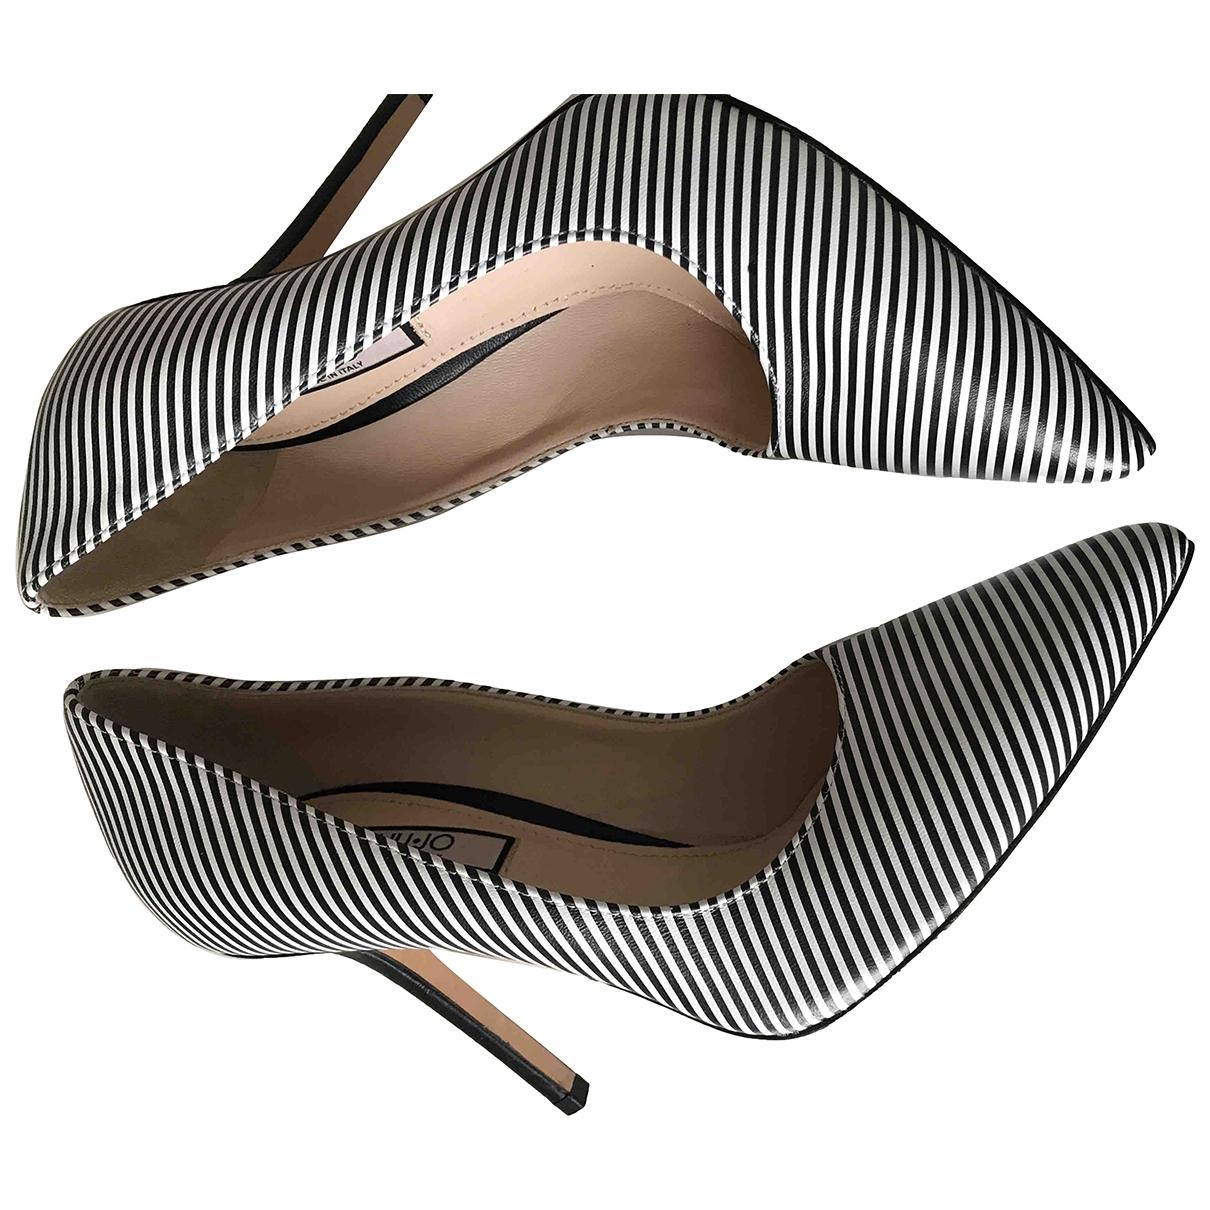 Liu.jo - Escarpins   pour femme en cuir - multicolore